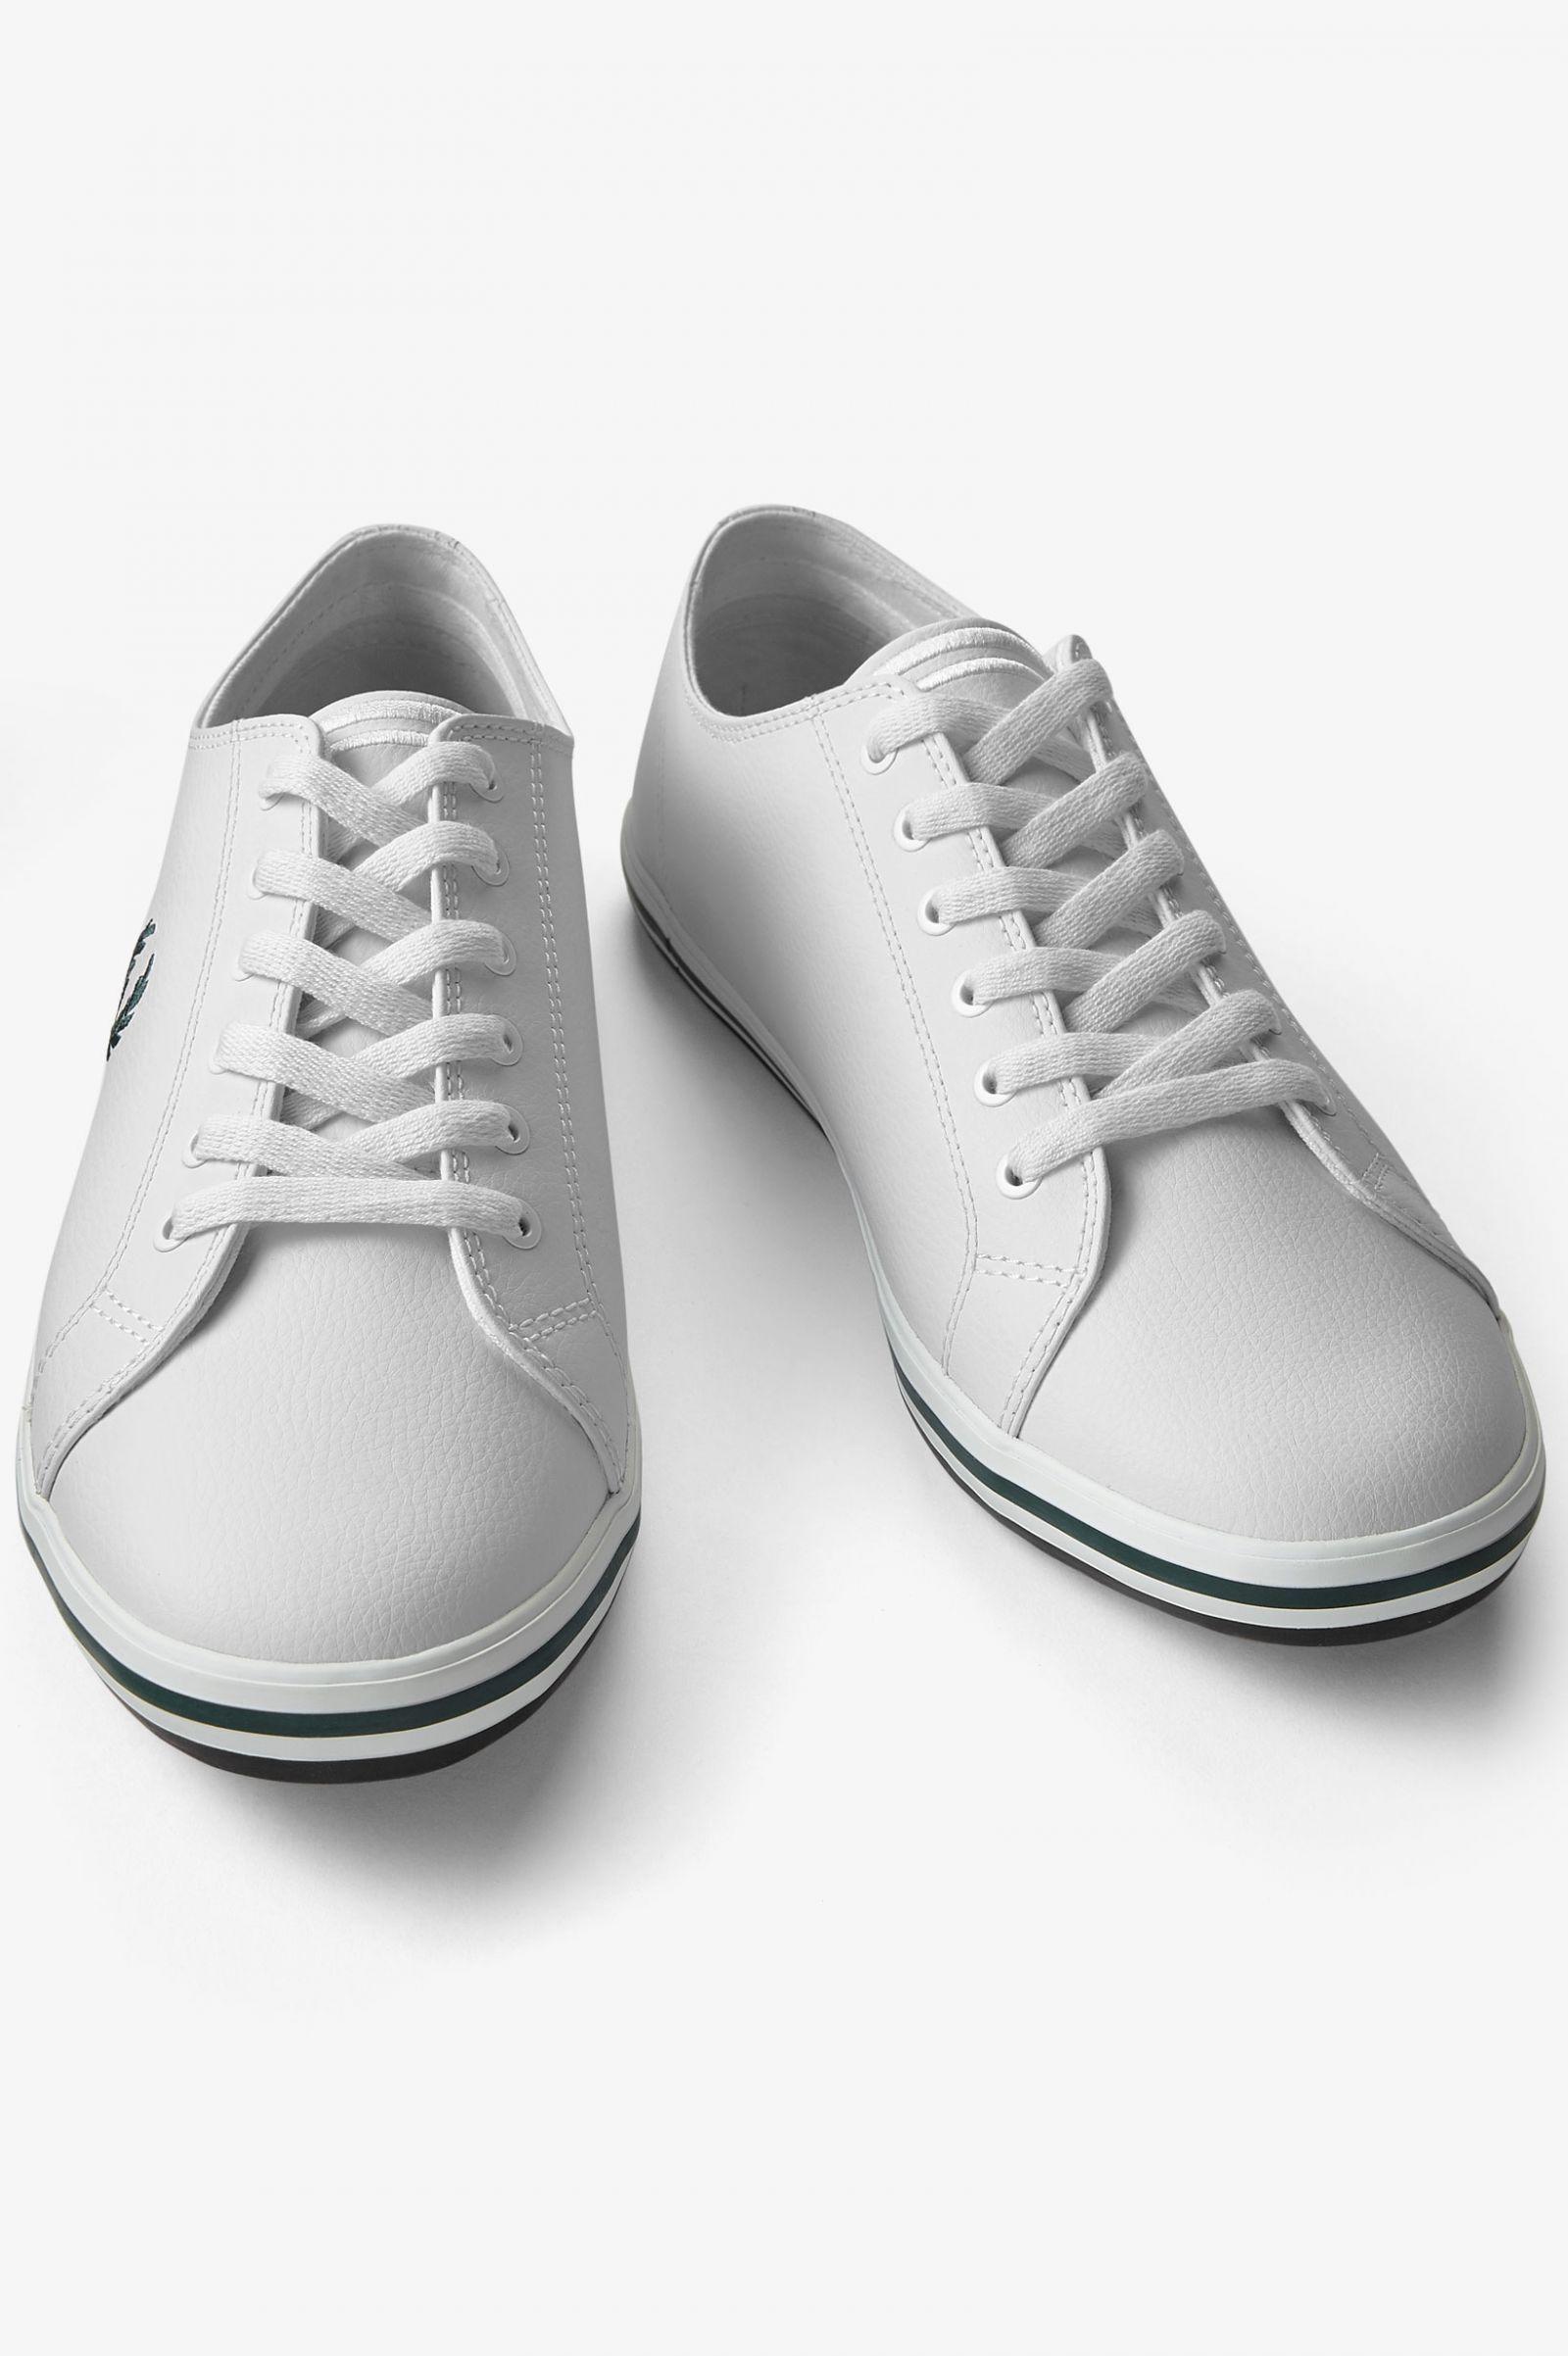 Kingston Leather - White | Men's